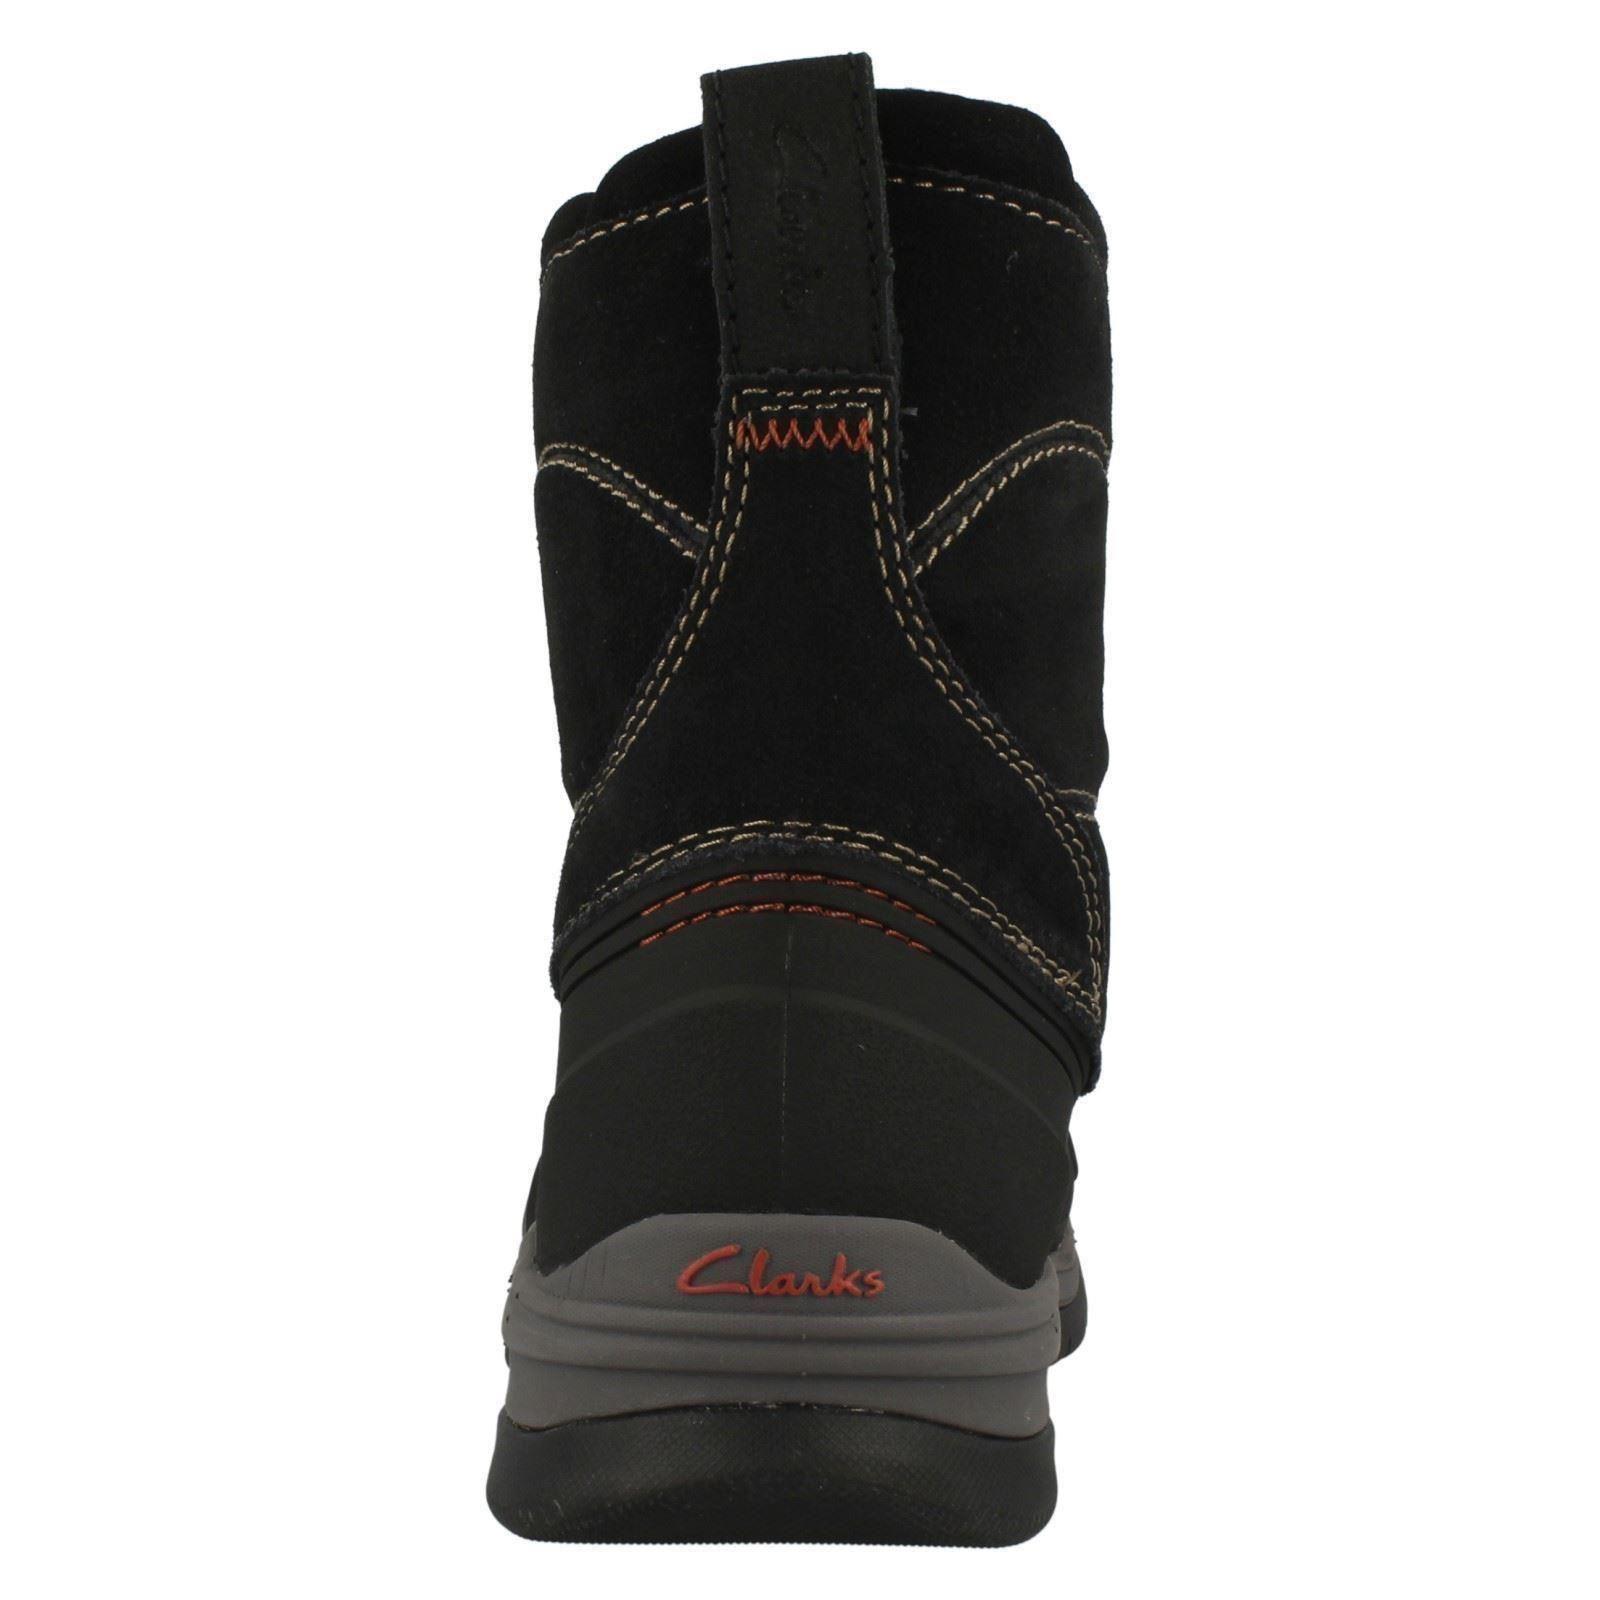 Mens-Clarks-Outdoor-Boots-Nashoba-Summit thumbnail 7